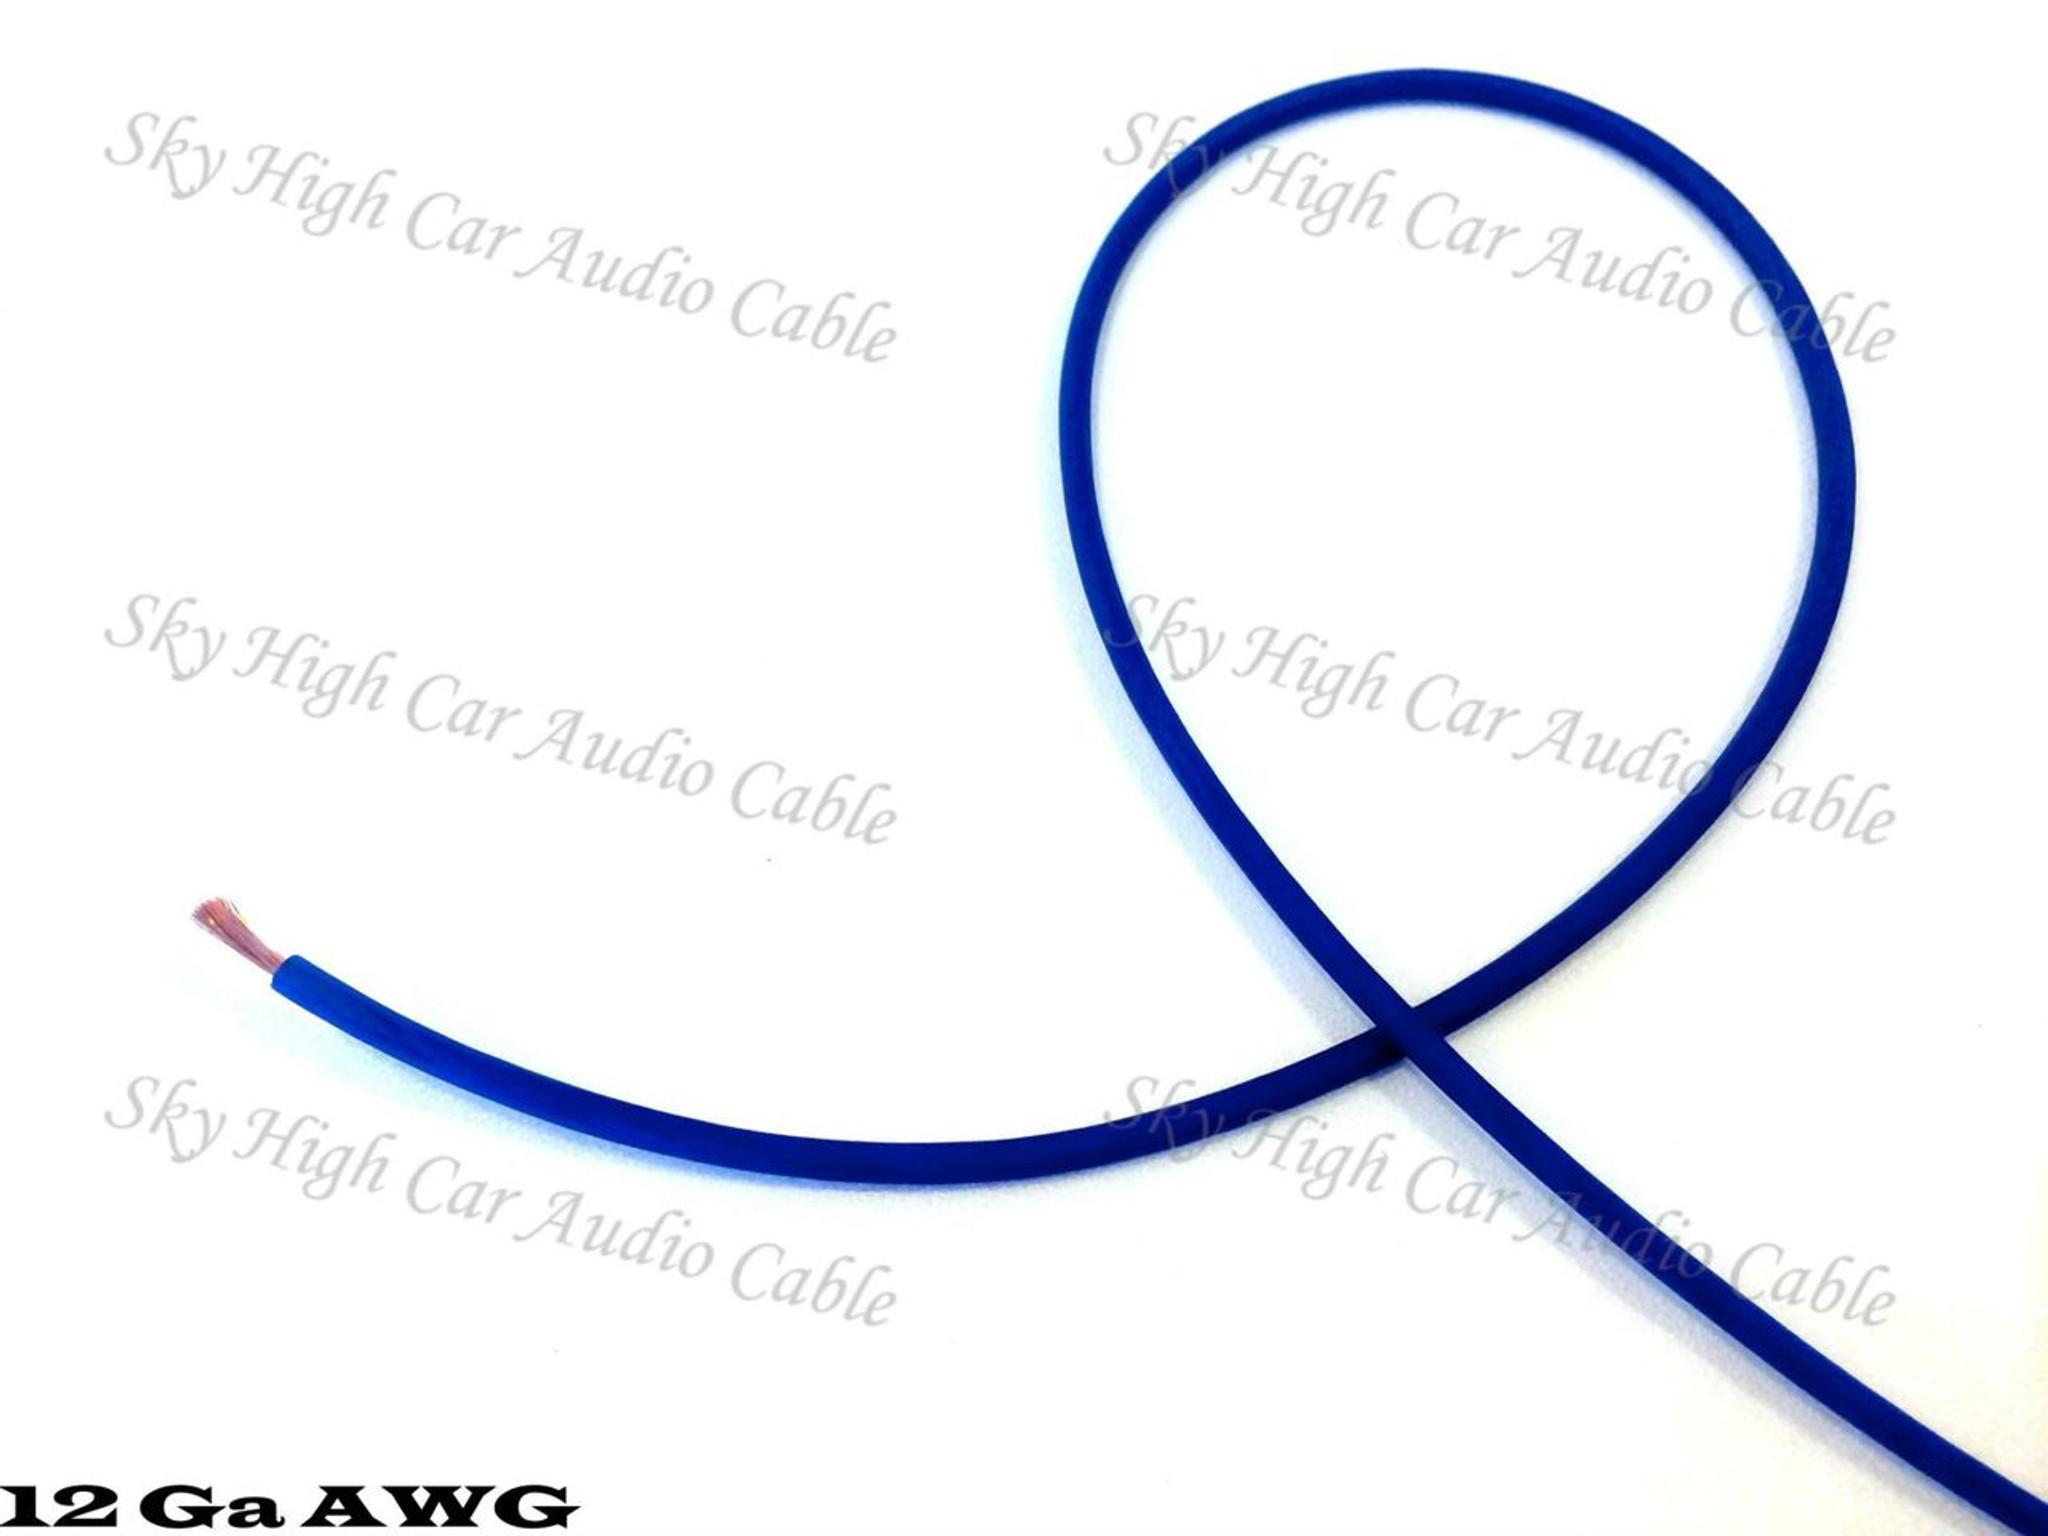 sky phone line wiring diagram sky high car audio ofc 12 gauge primary wire 500ft spool  sky high car audio ofc 12 gauge primary